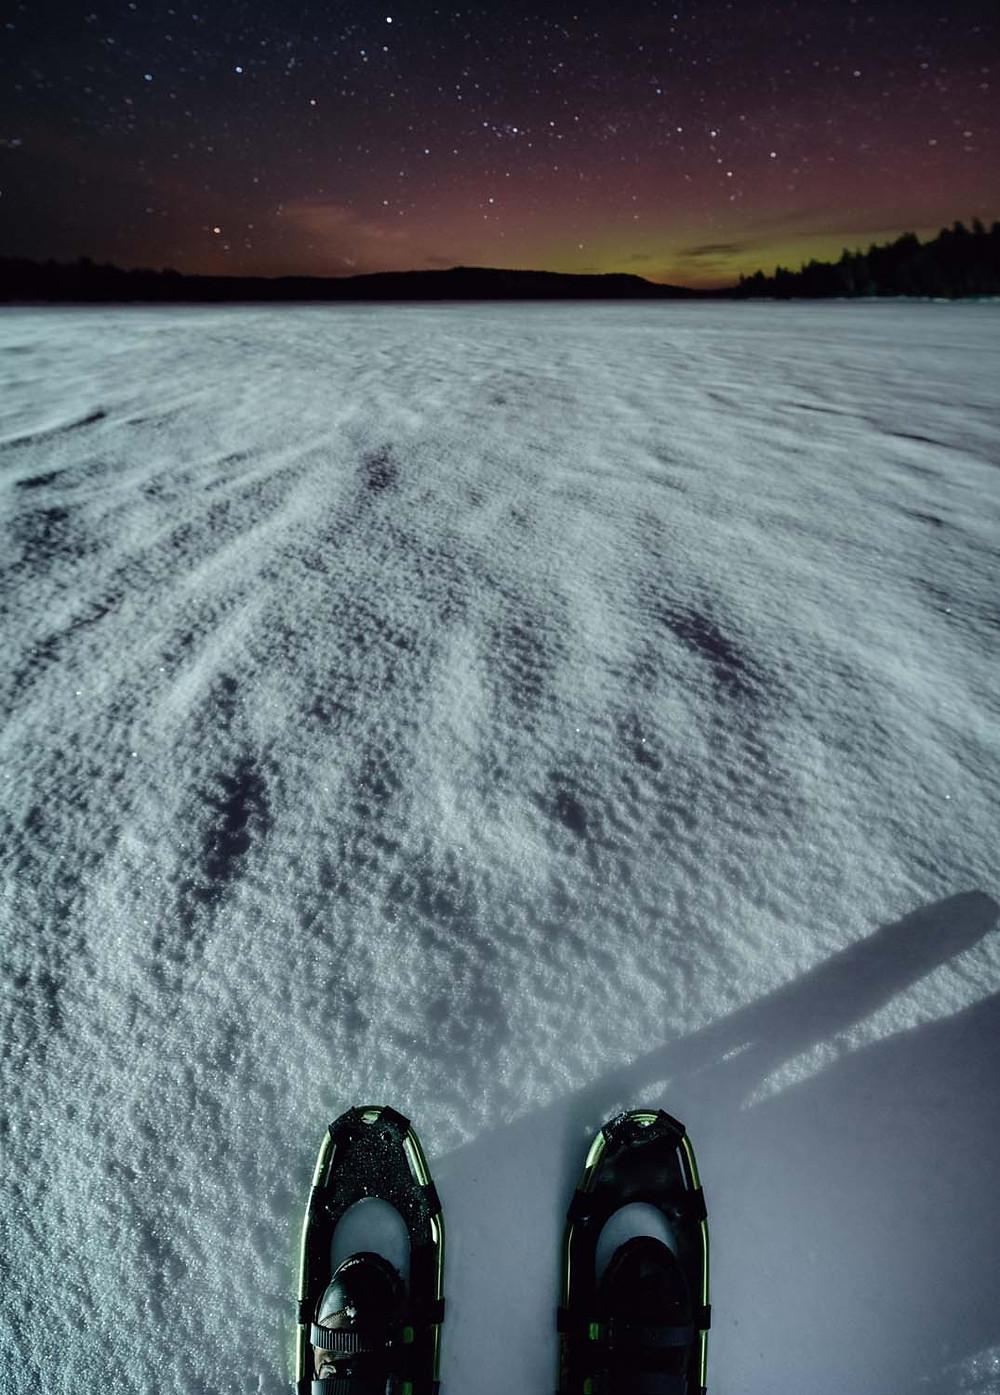 Snowshoe under the northern lights